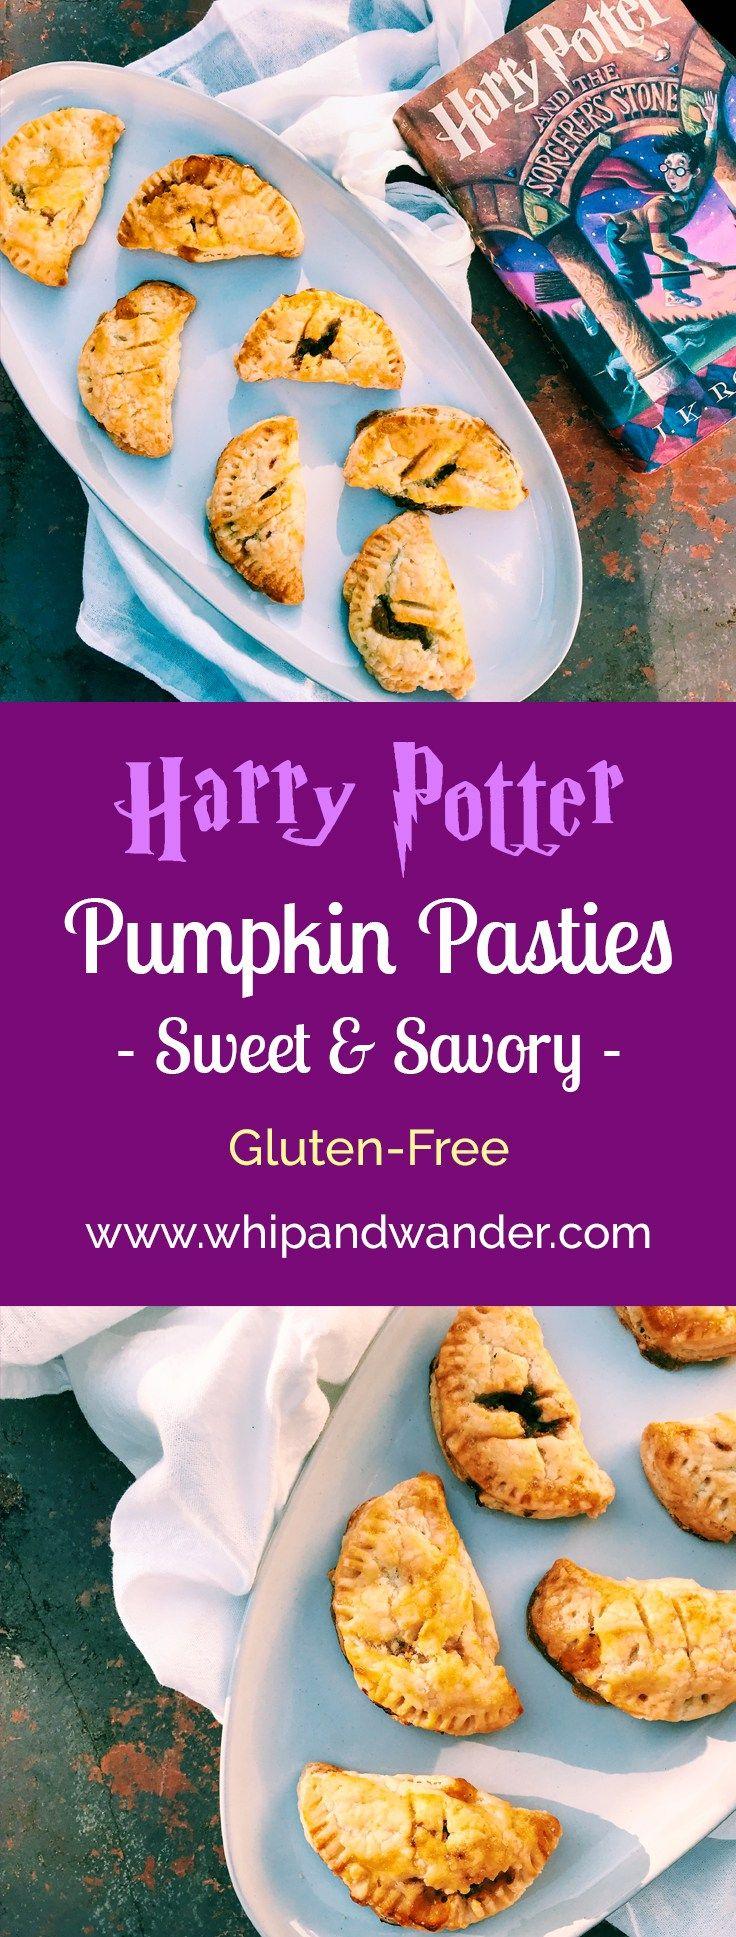 Pumpkin Pasties Sweet And Savory Versions Recipe Pumpkin Pasties Pumpkin Spice Recipe Gluten Free Pumpkin